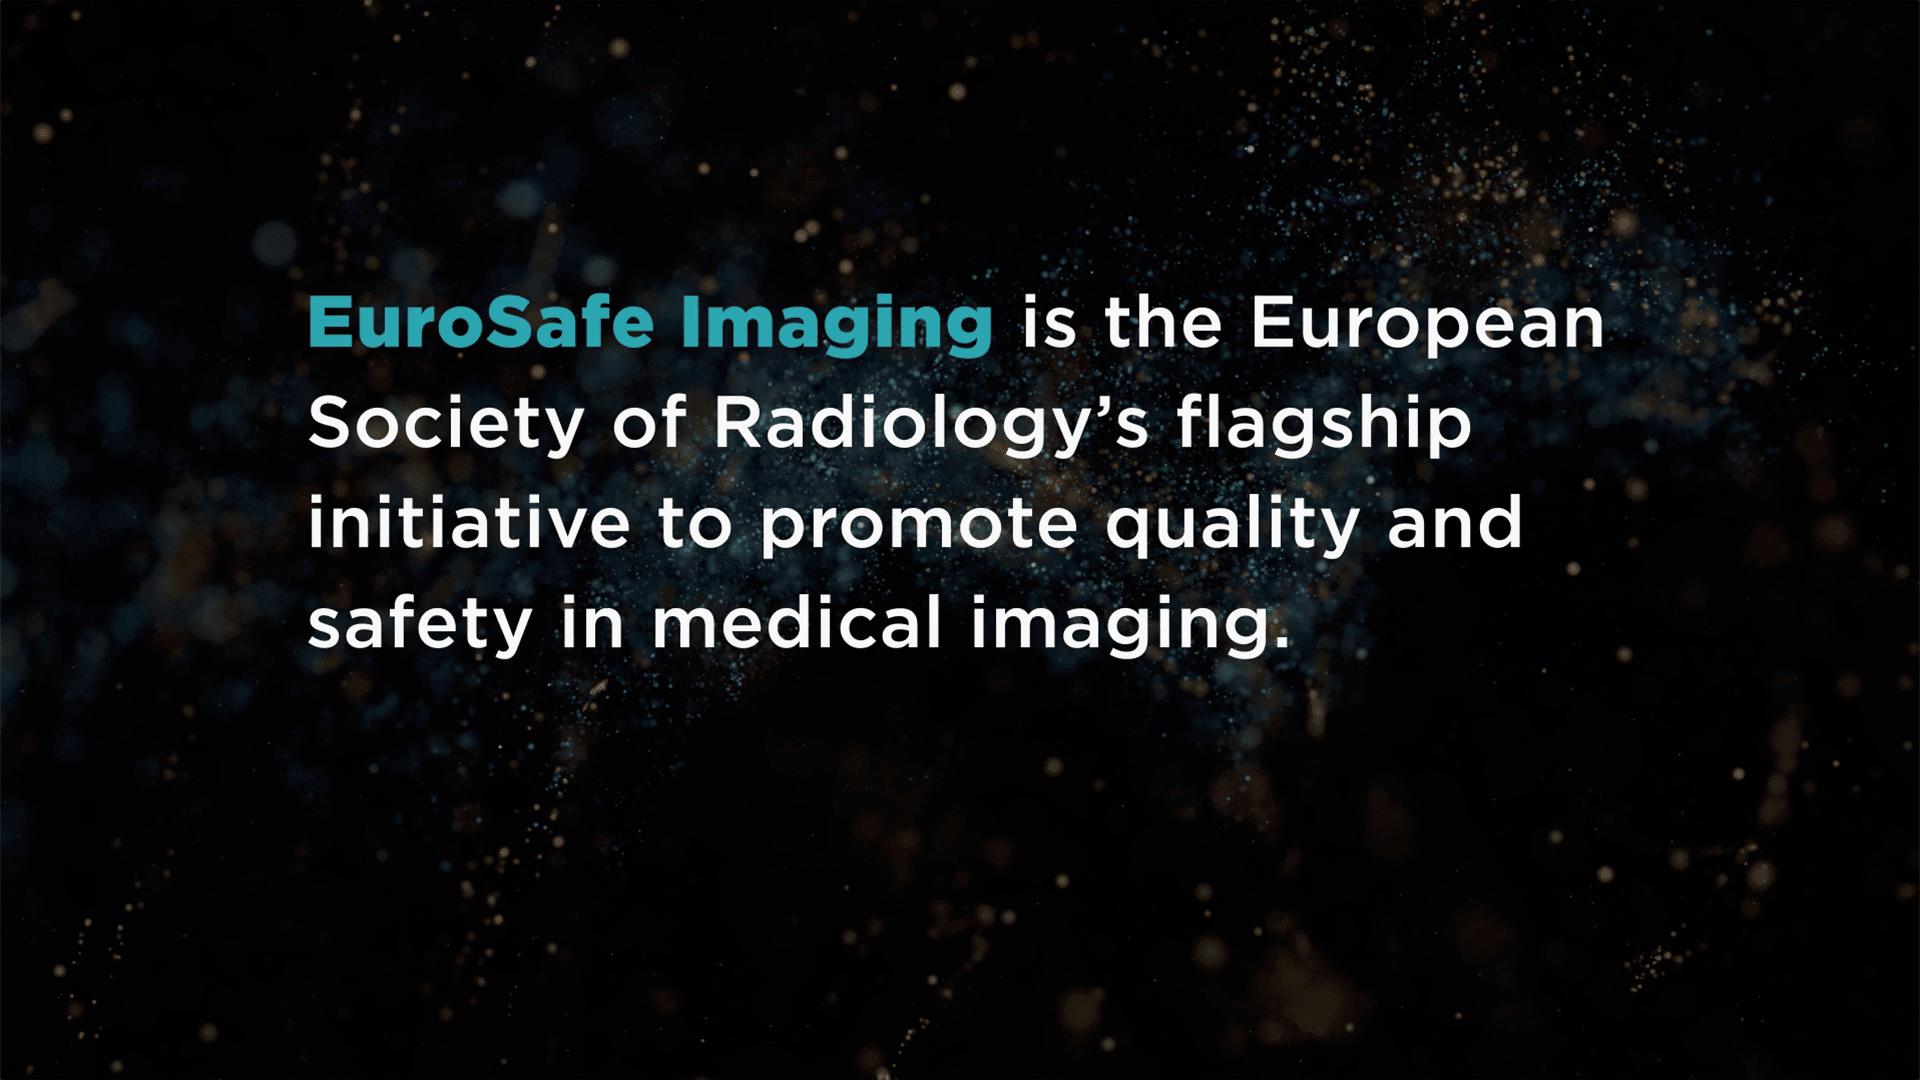 Eurosafe Imaging